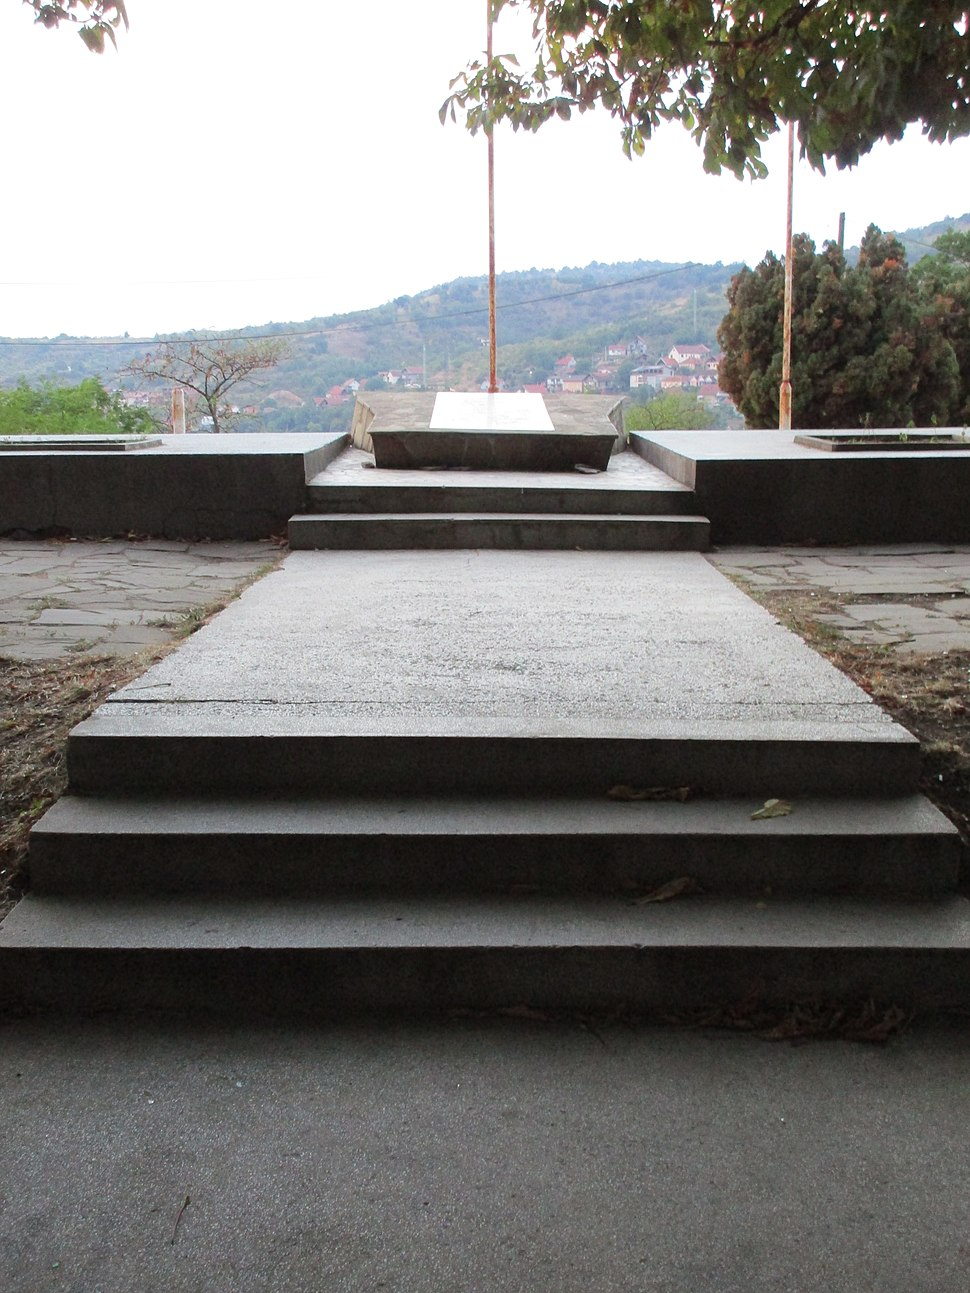 Spomenik na Hisaru, Prokuplje 26